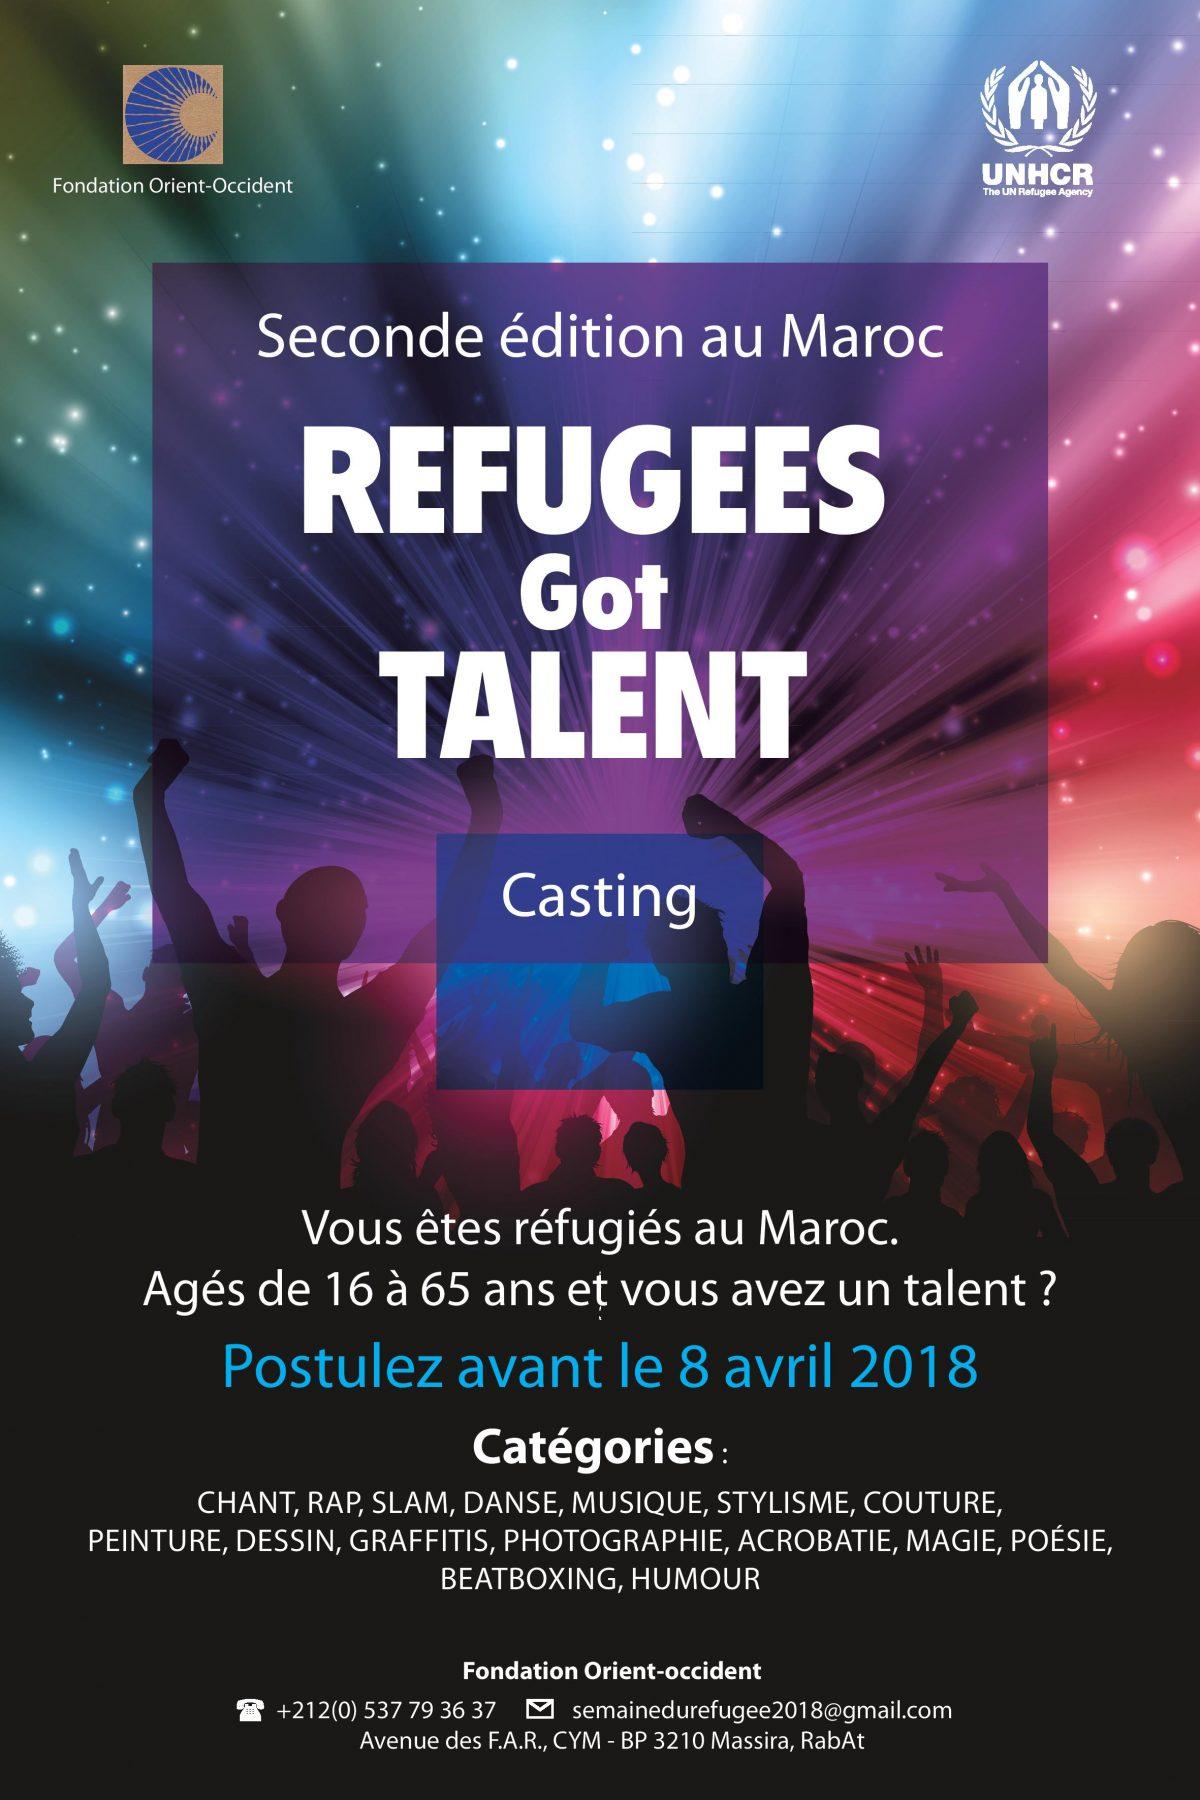 Refugees Got Talent - Casting - Fondation Orient-Occident